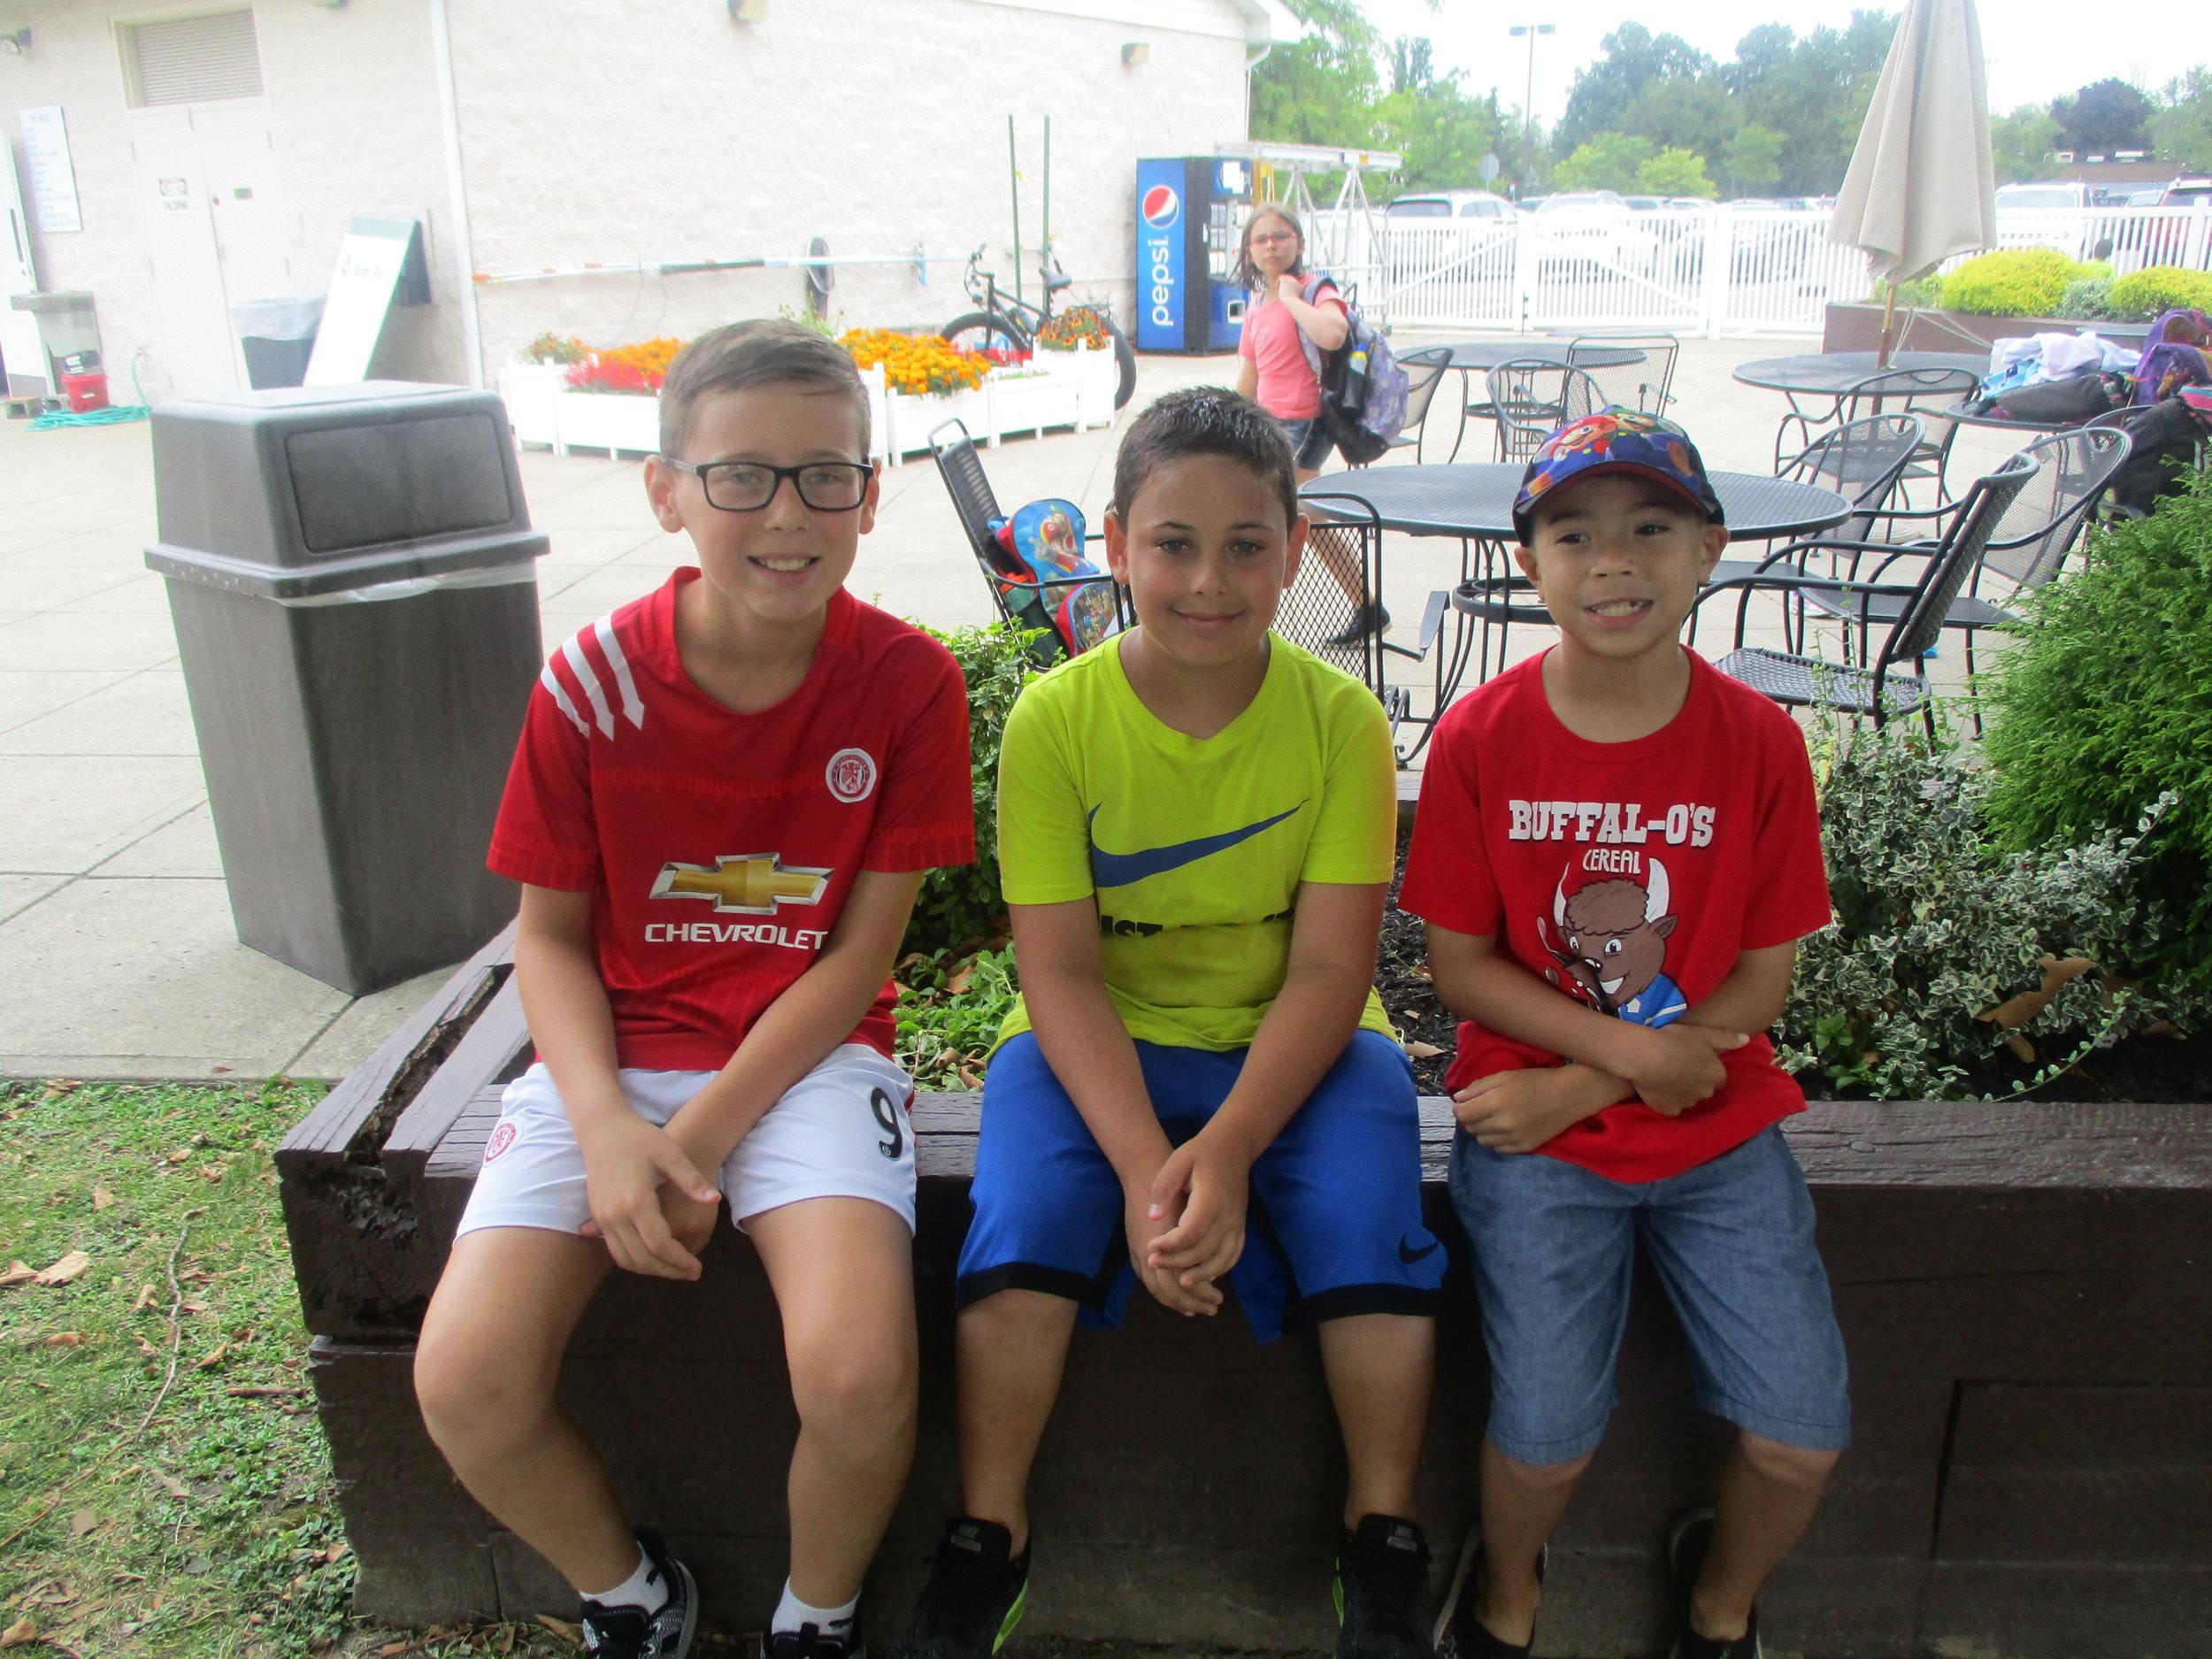 Senior Camp (grades 3-6) -